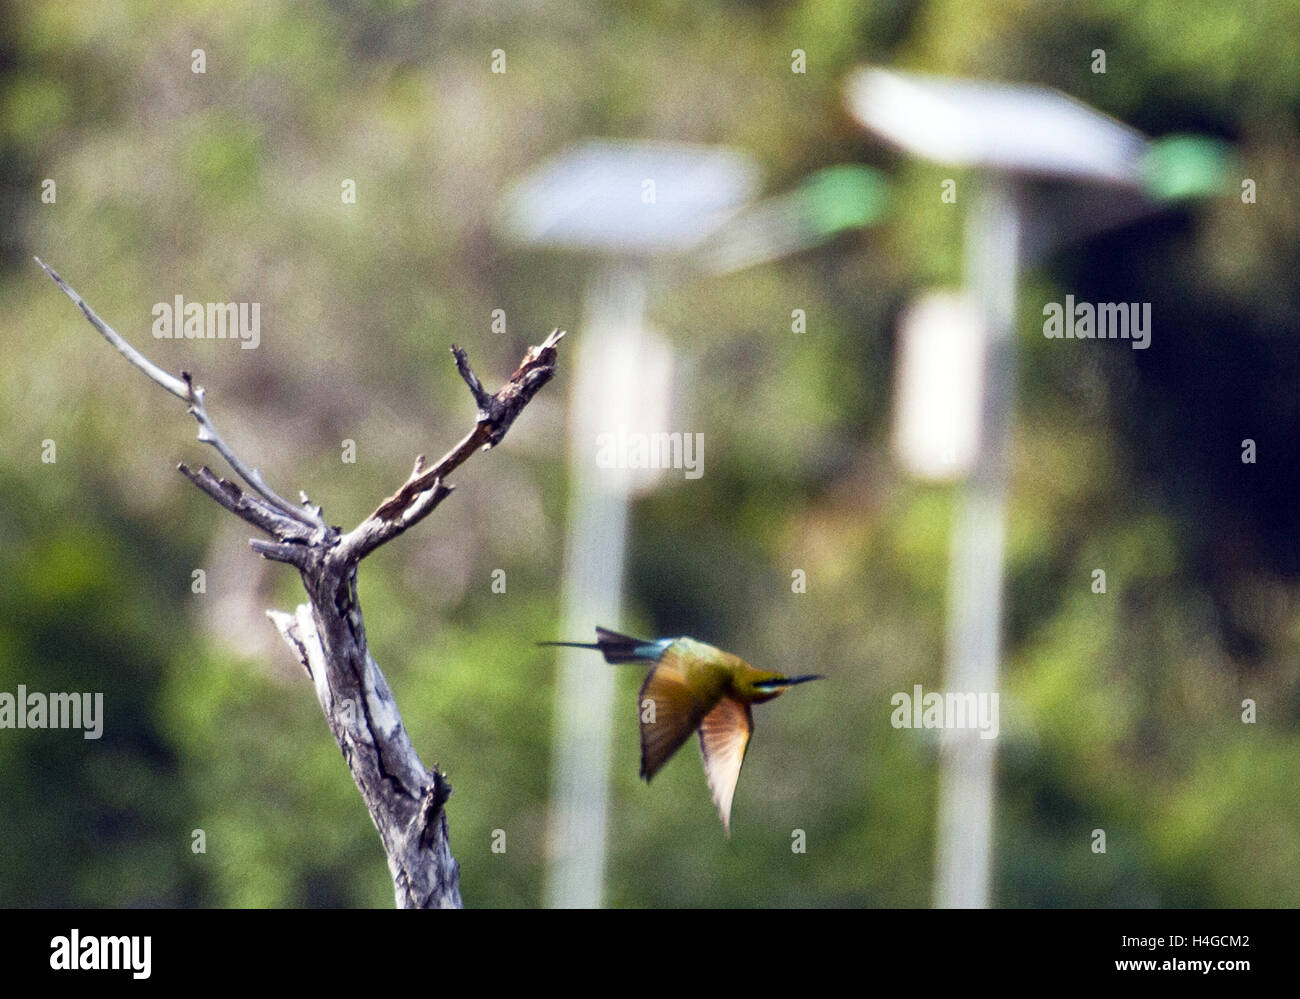 Yellow Throat Patch Imágenes De Stock & Yellow Throat Patch Fotos De ...